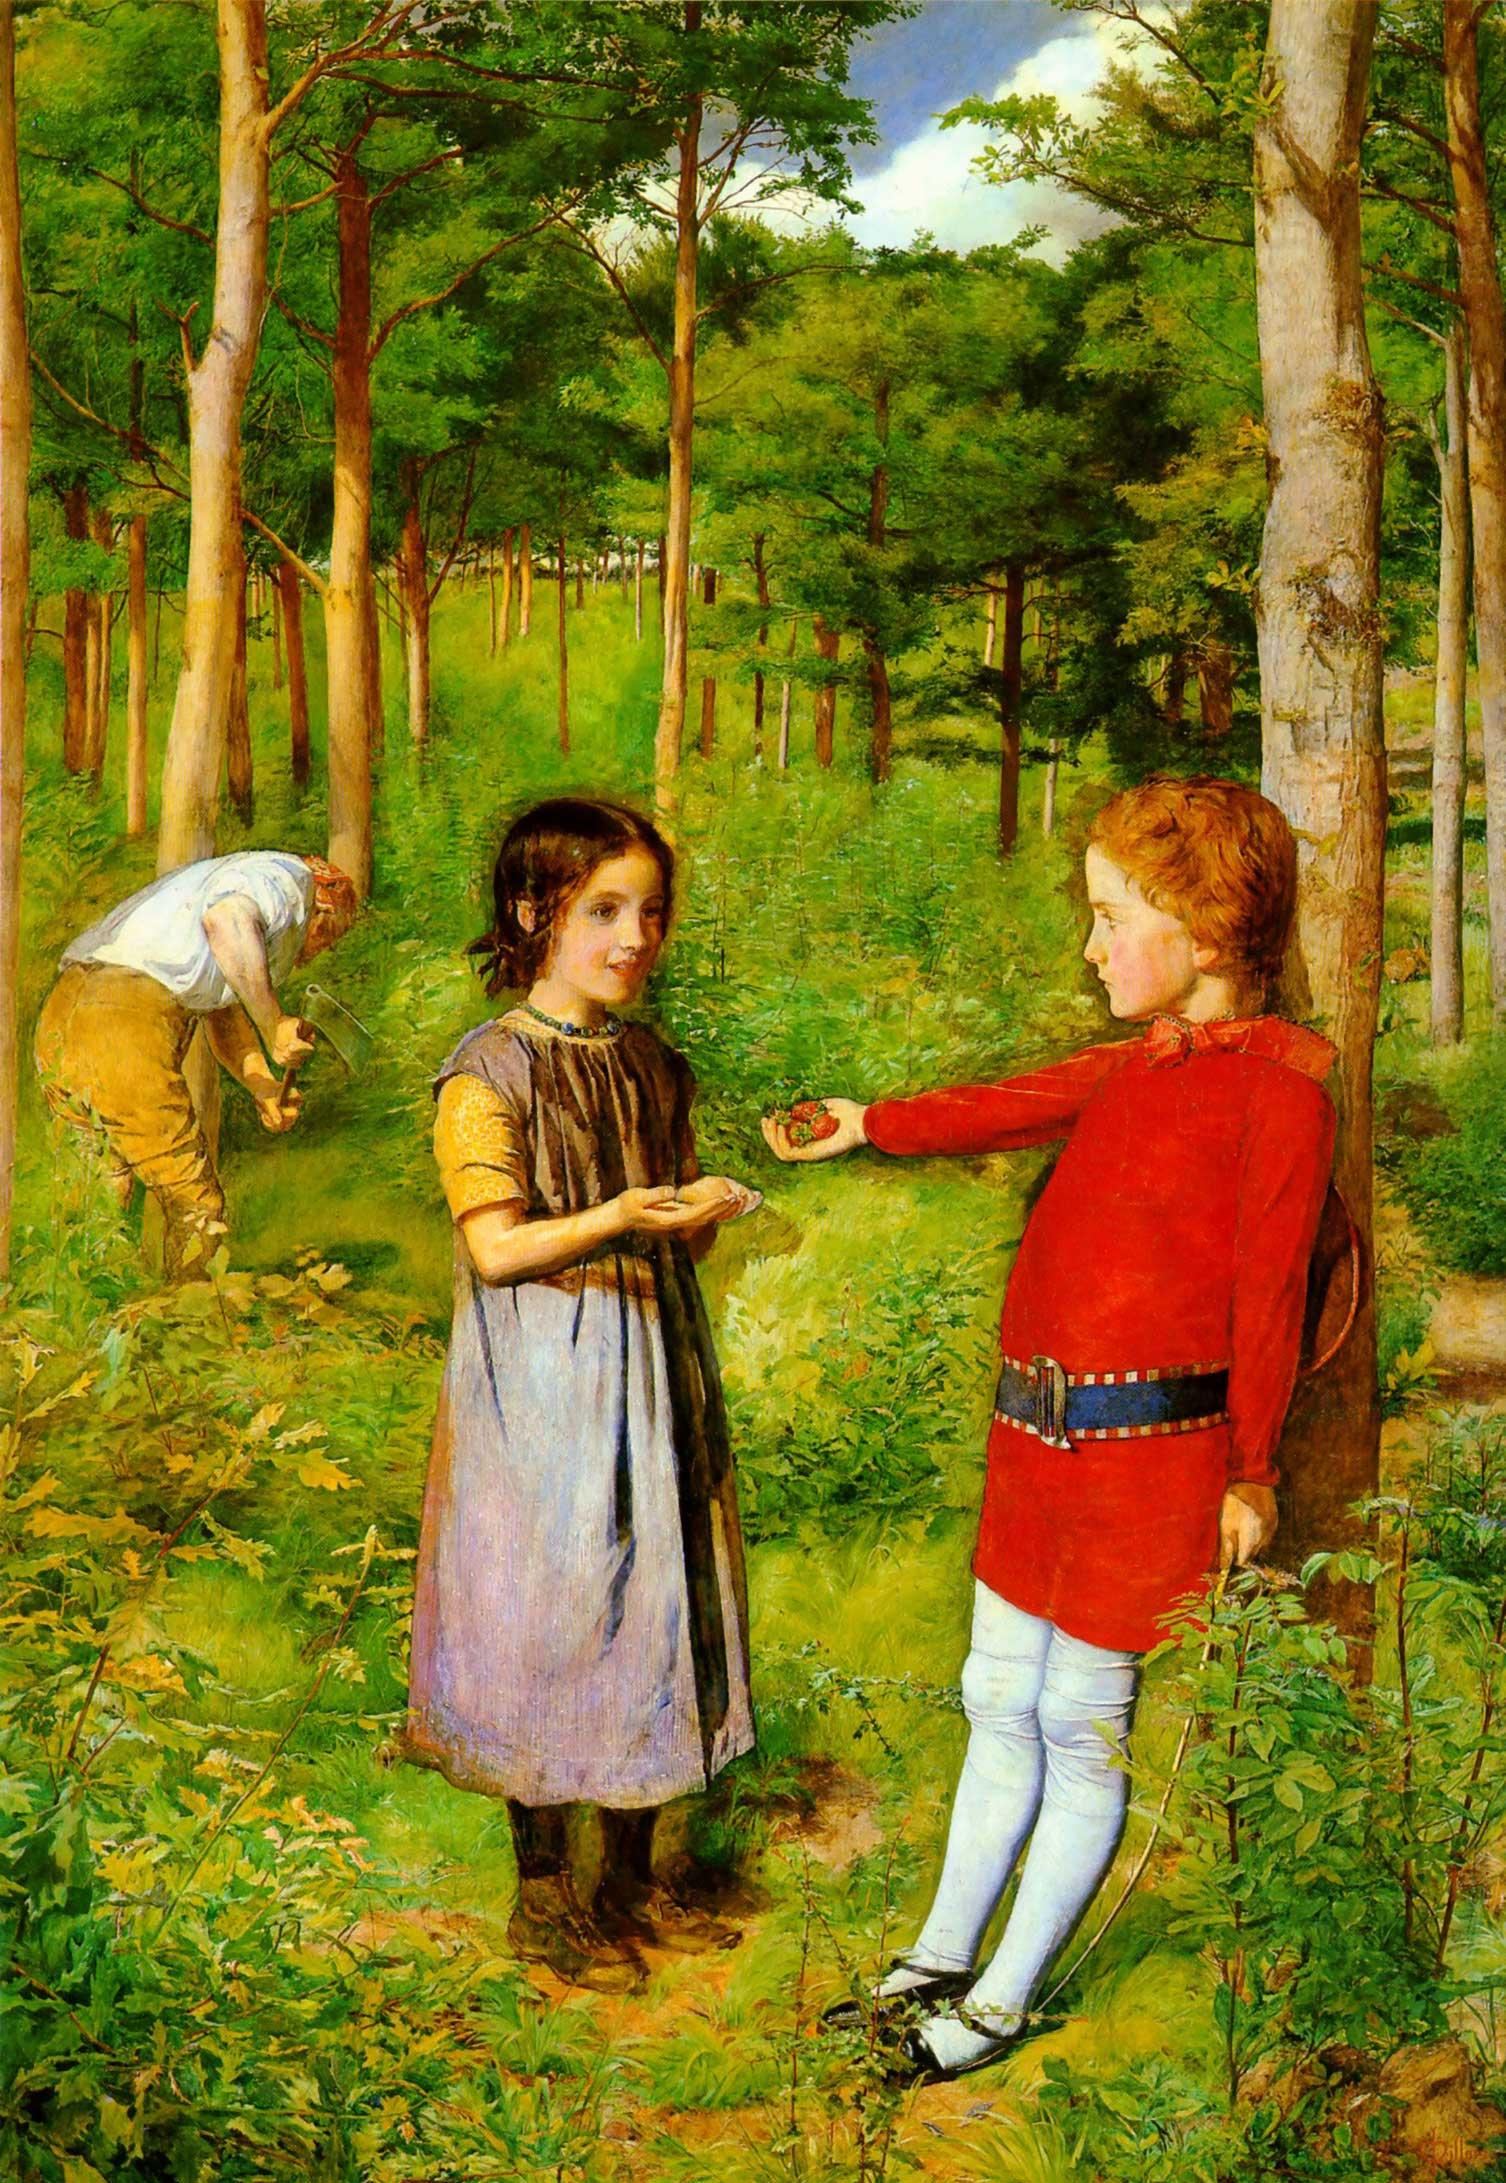 File:The Woodman's Daughter - John Everett Millais.jpg - Wikimedia Commons